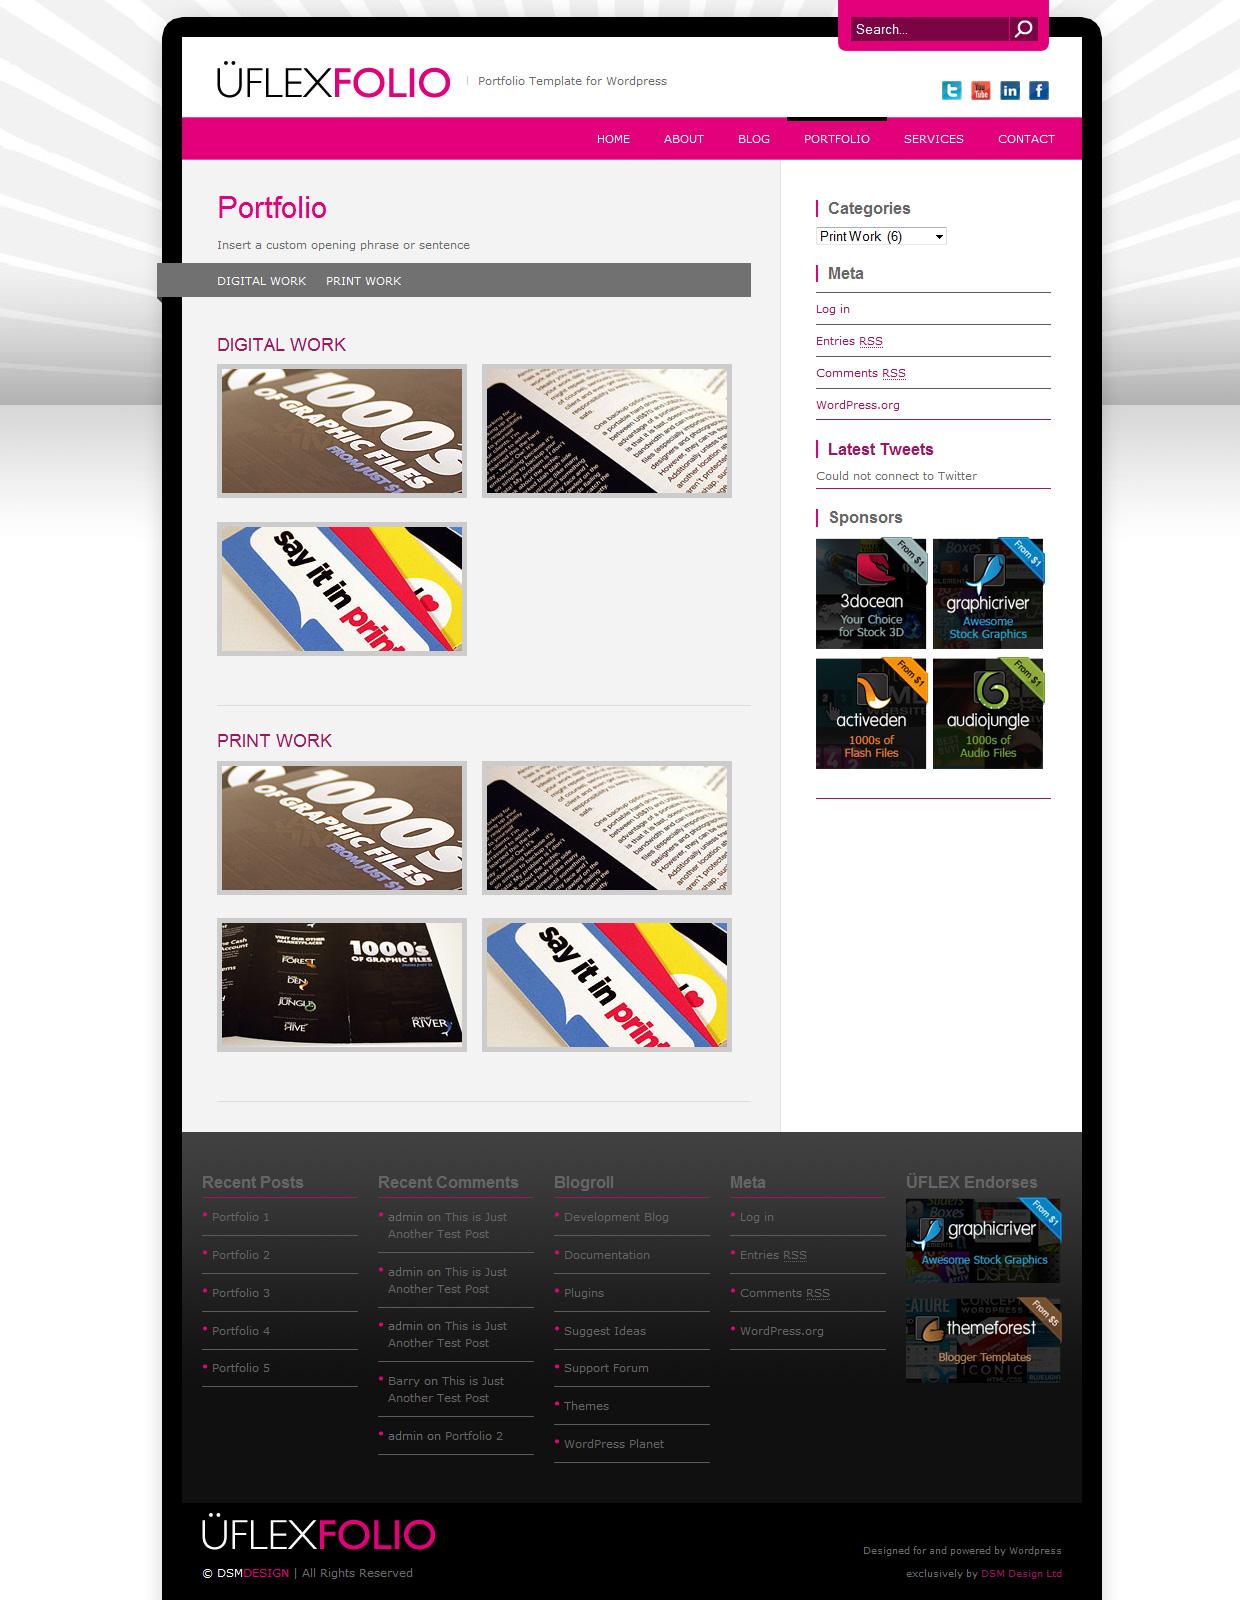 uFlexfolio - Portfolio Theme for Wordpress